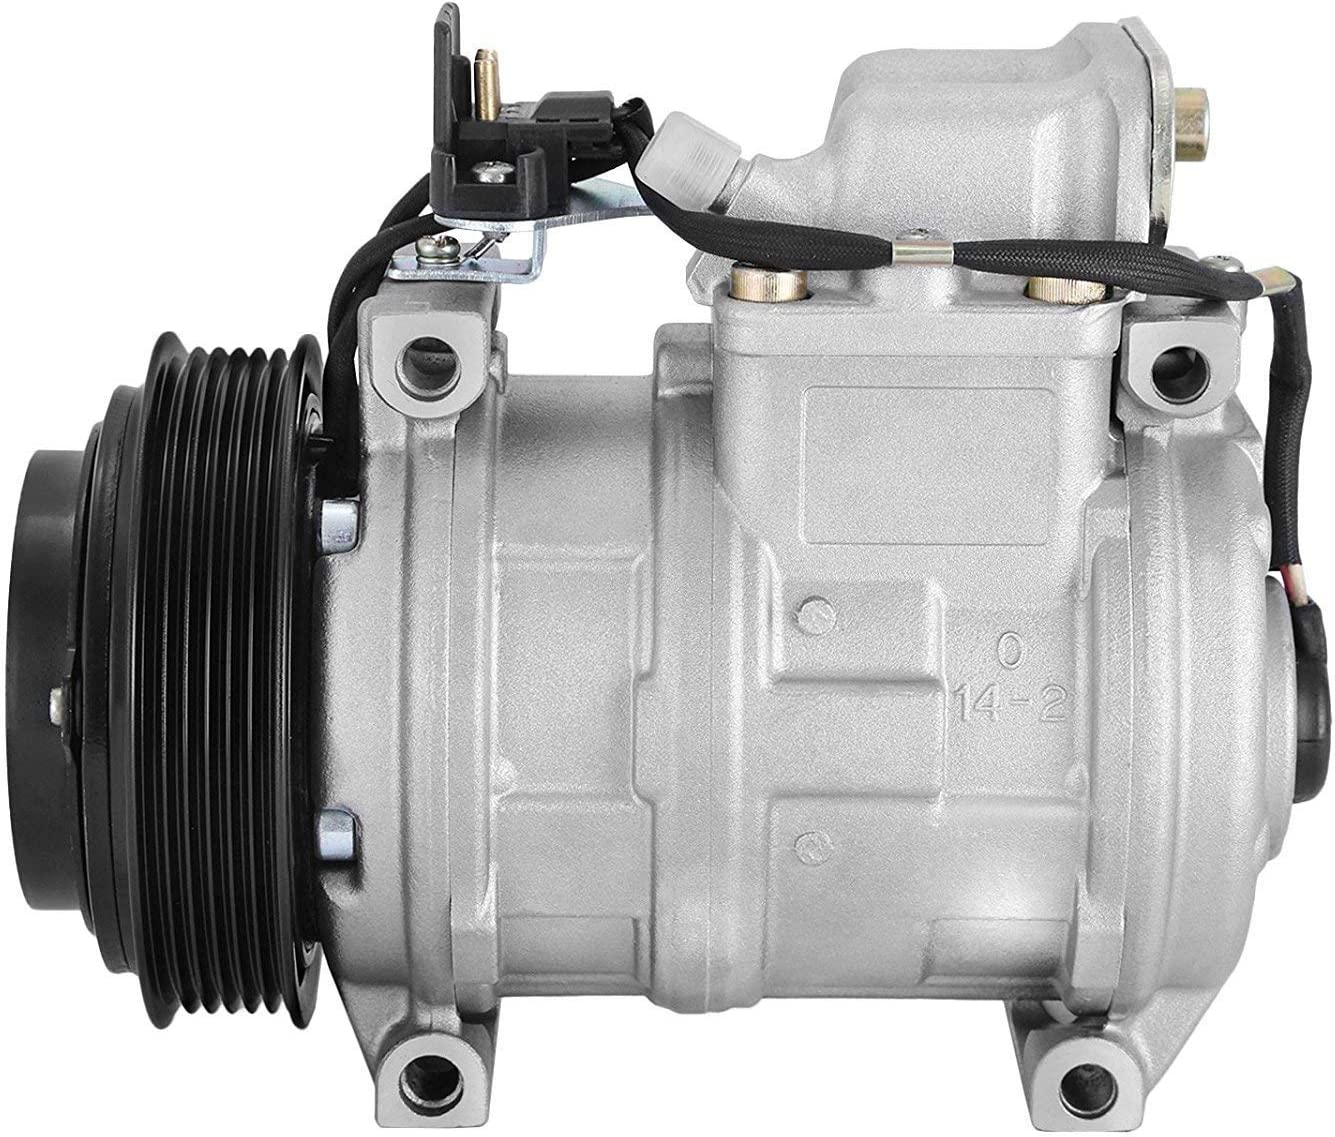 RYC Reman AC Compressor FG671 2009 2010 2011 2012 2013 2014 Nissan Maxima 3.5L